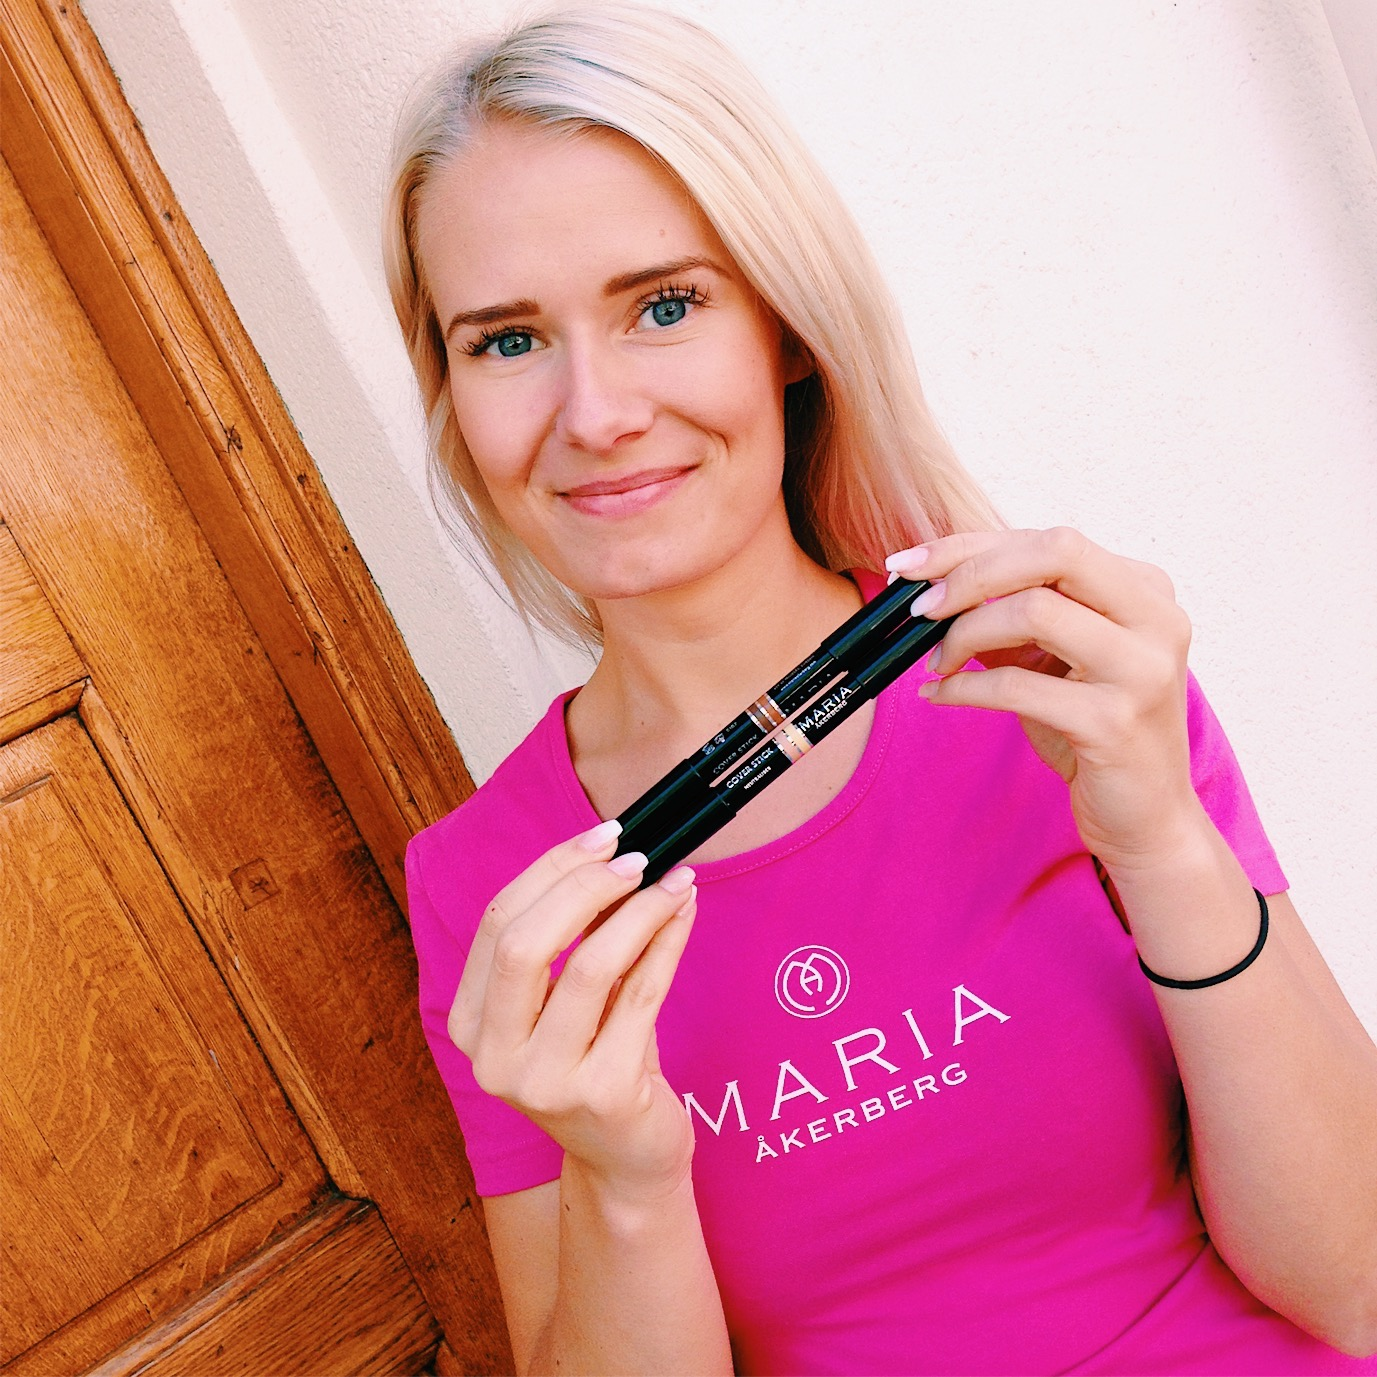 Cover Stick - Maria Åkerberg